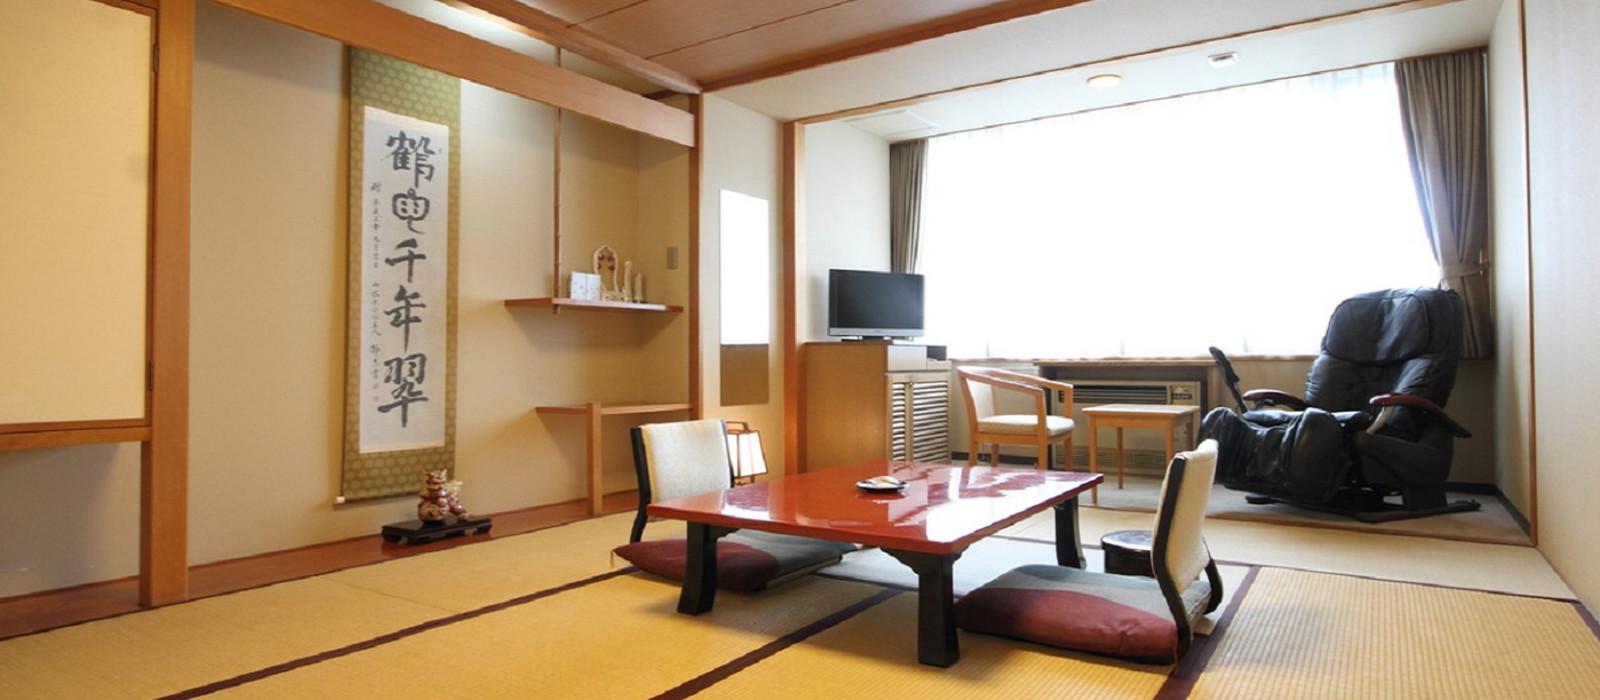 Hotel Yutorelo Toyako Ryokan Japan